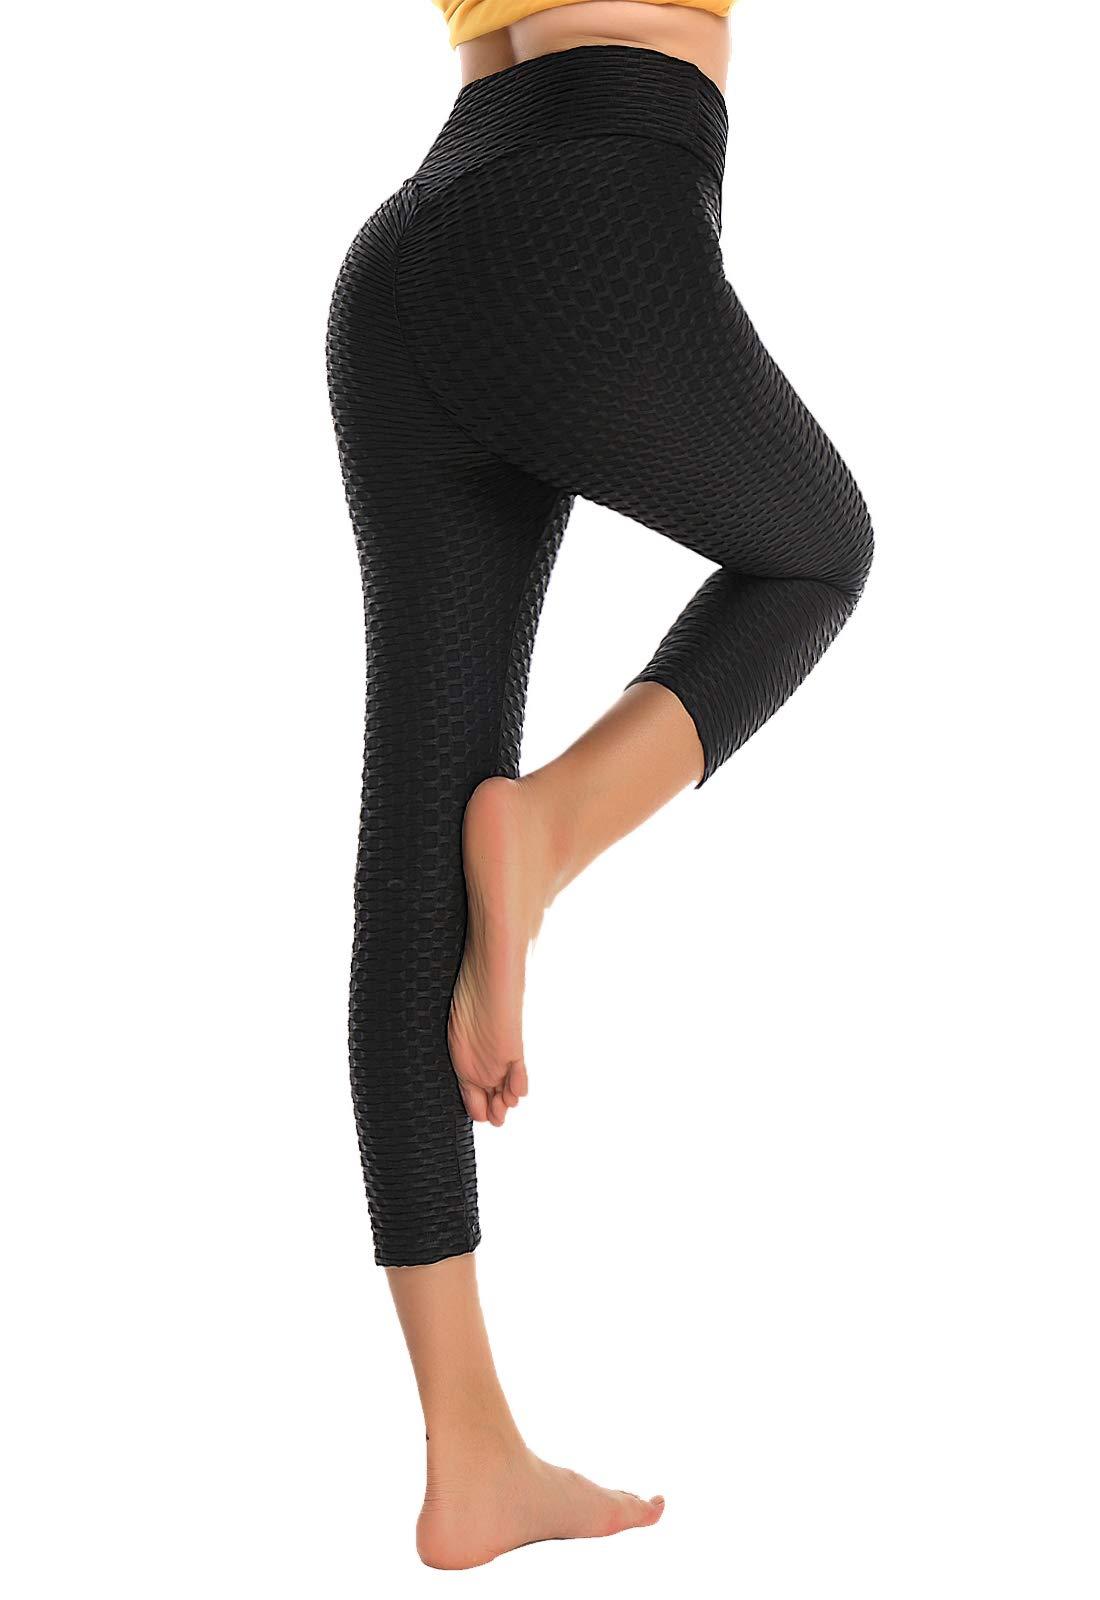 SEASUM Pantaloni Tuta da Donna Yoga Pants Push up Leggings Sportivi Anticellulite Elastici Collant